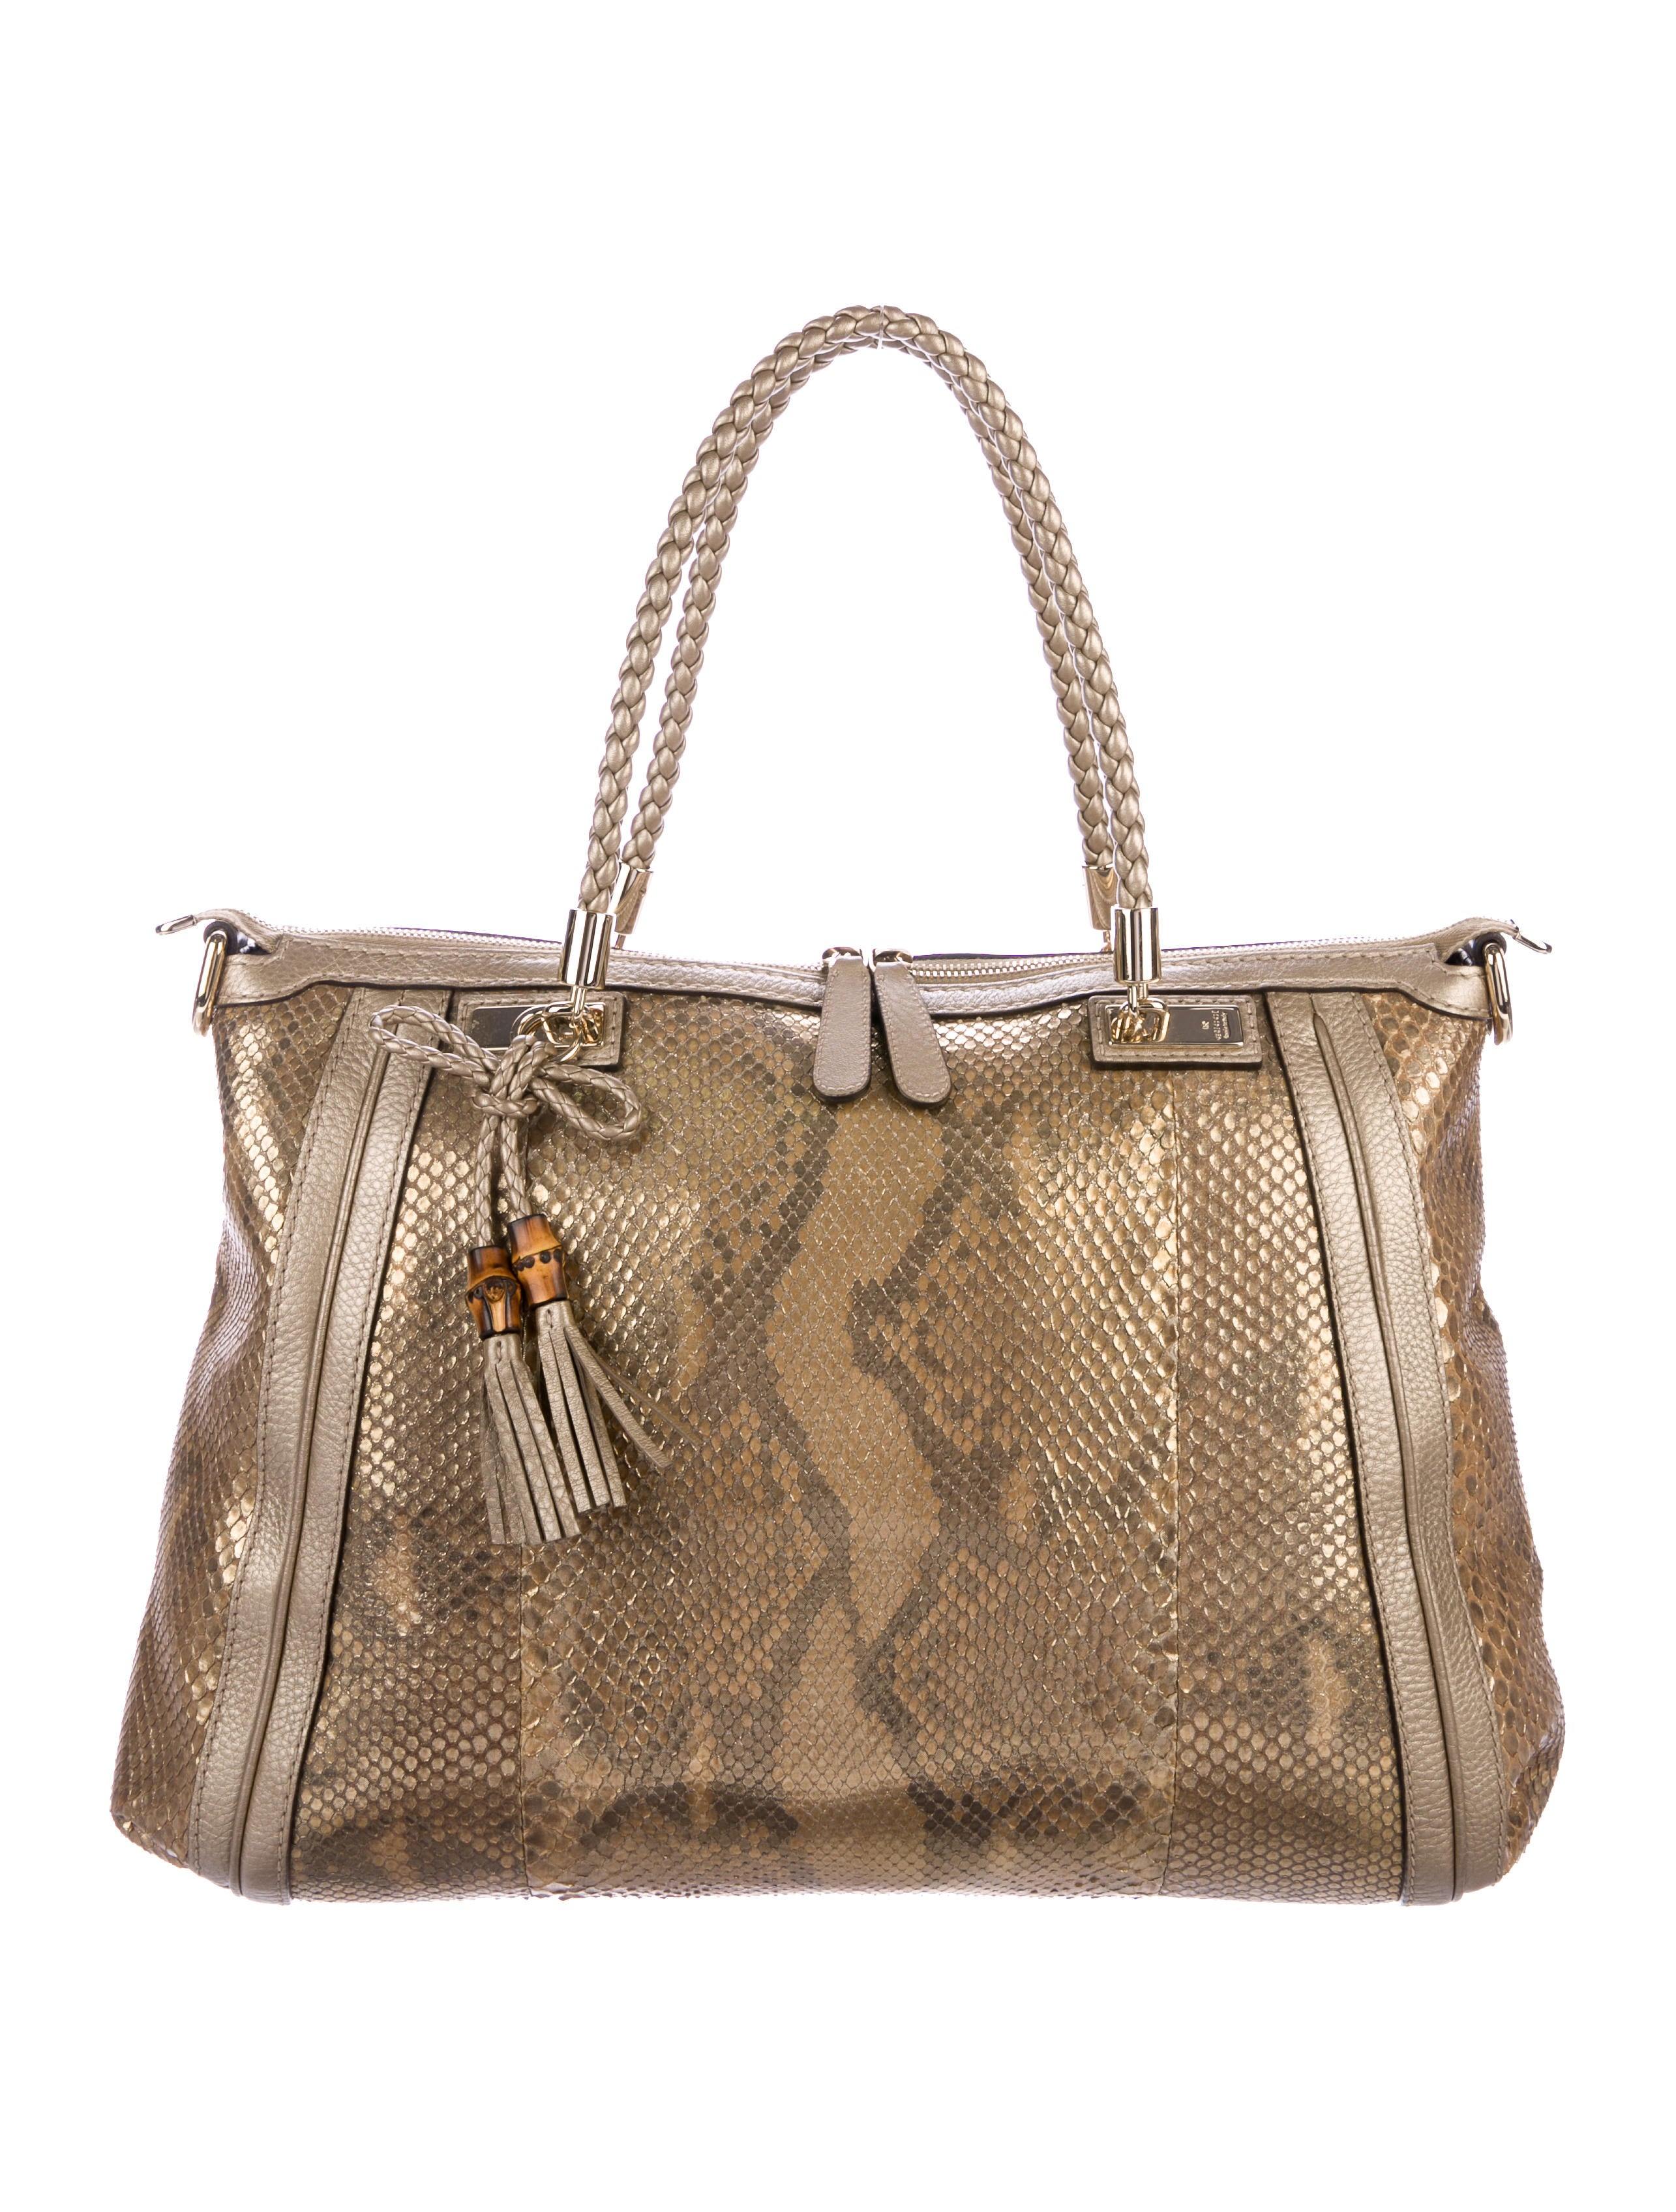 2411067bd1f Gucci Python Bella Top Handle Bag - Handbags - GUC205059